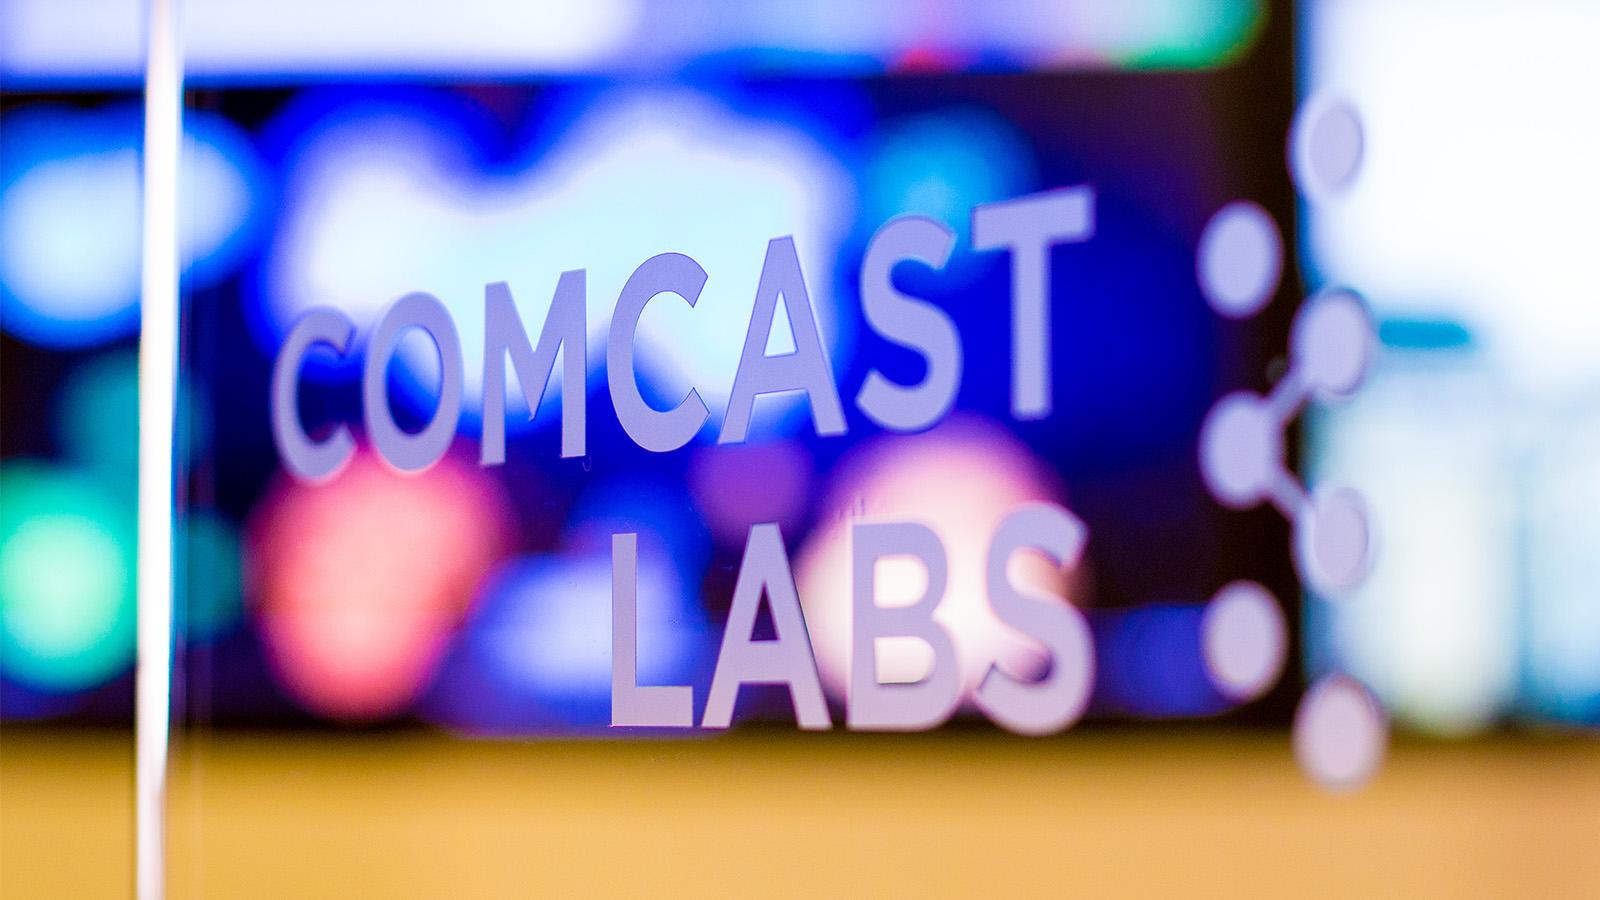 The Comcast Labs logo.